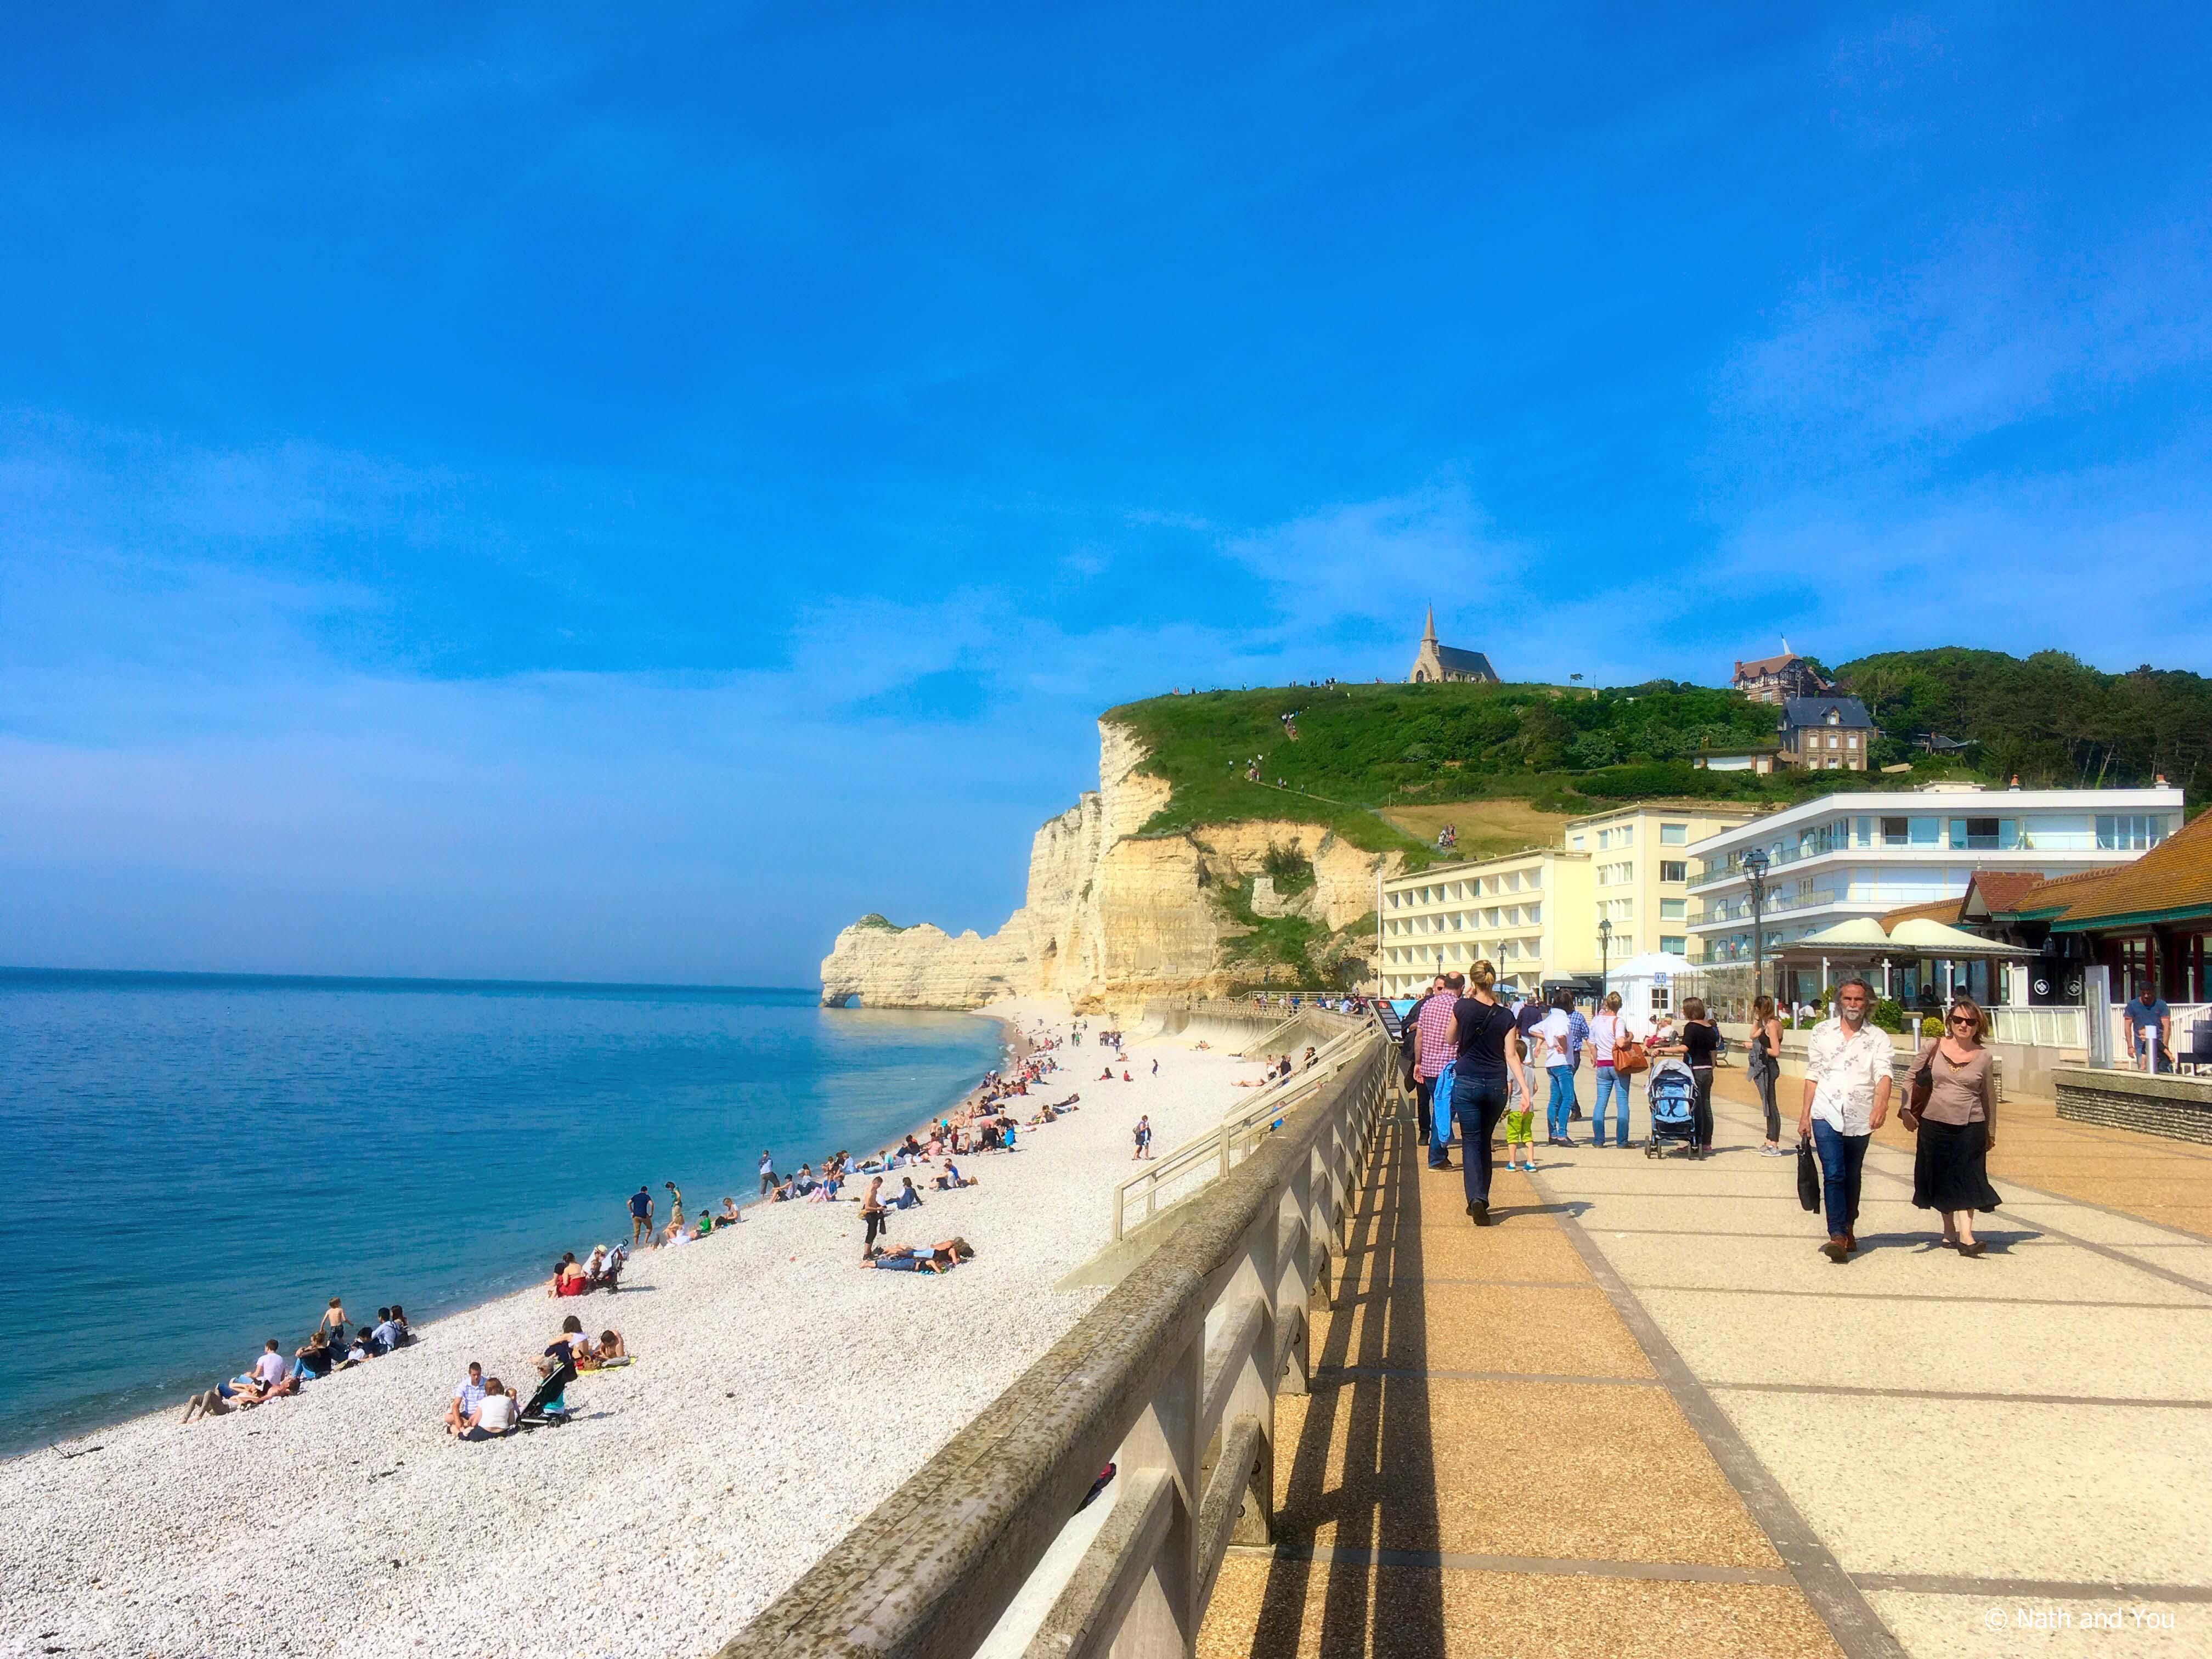 la-plage-falaises-etretat-nath-and-you